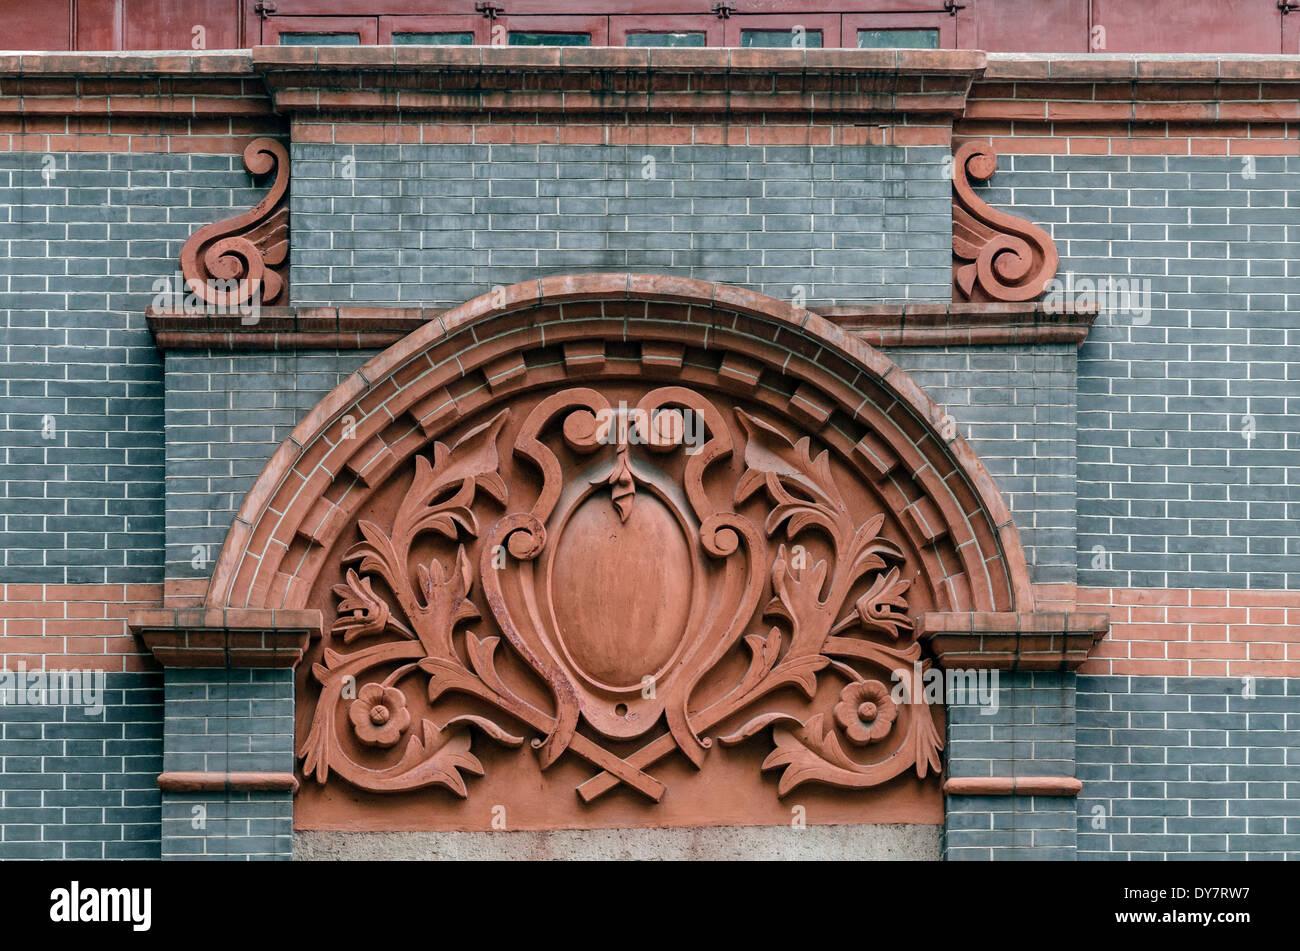 Traditional architecture, Xintiandi, Shanghai, China - Stock Image